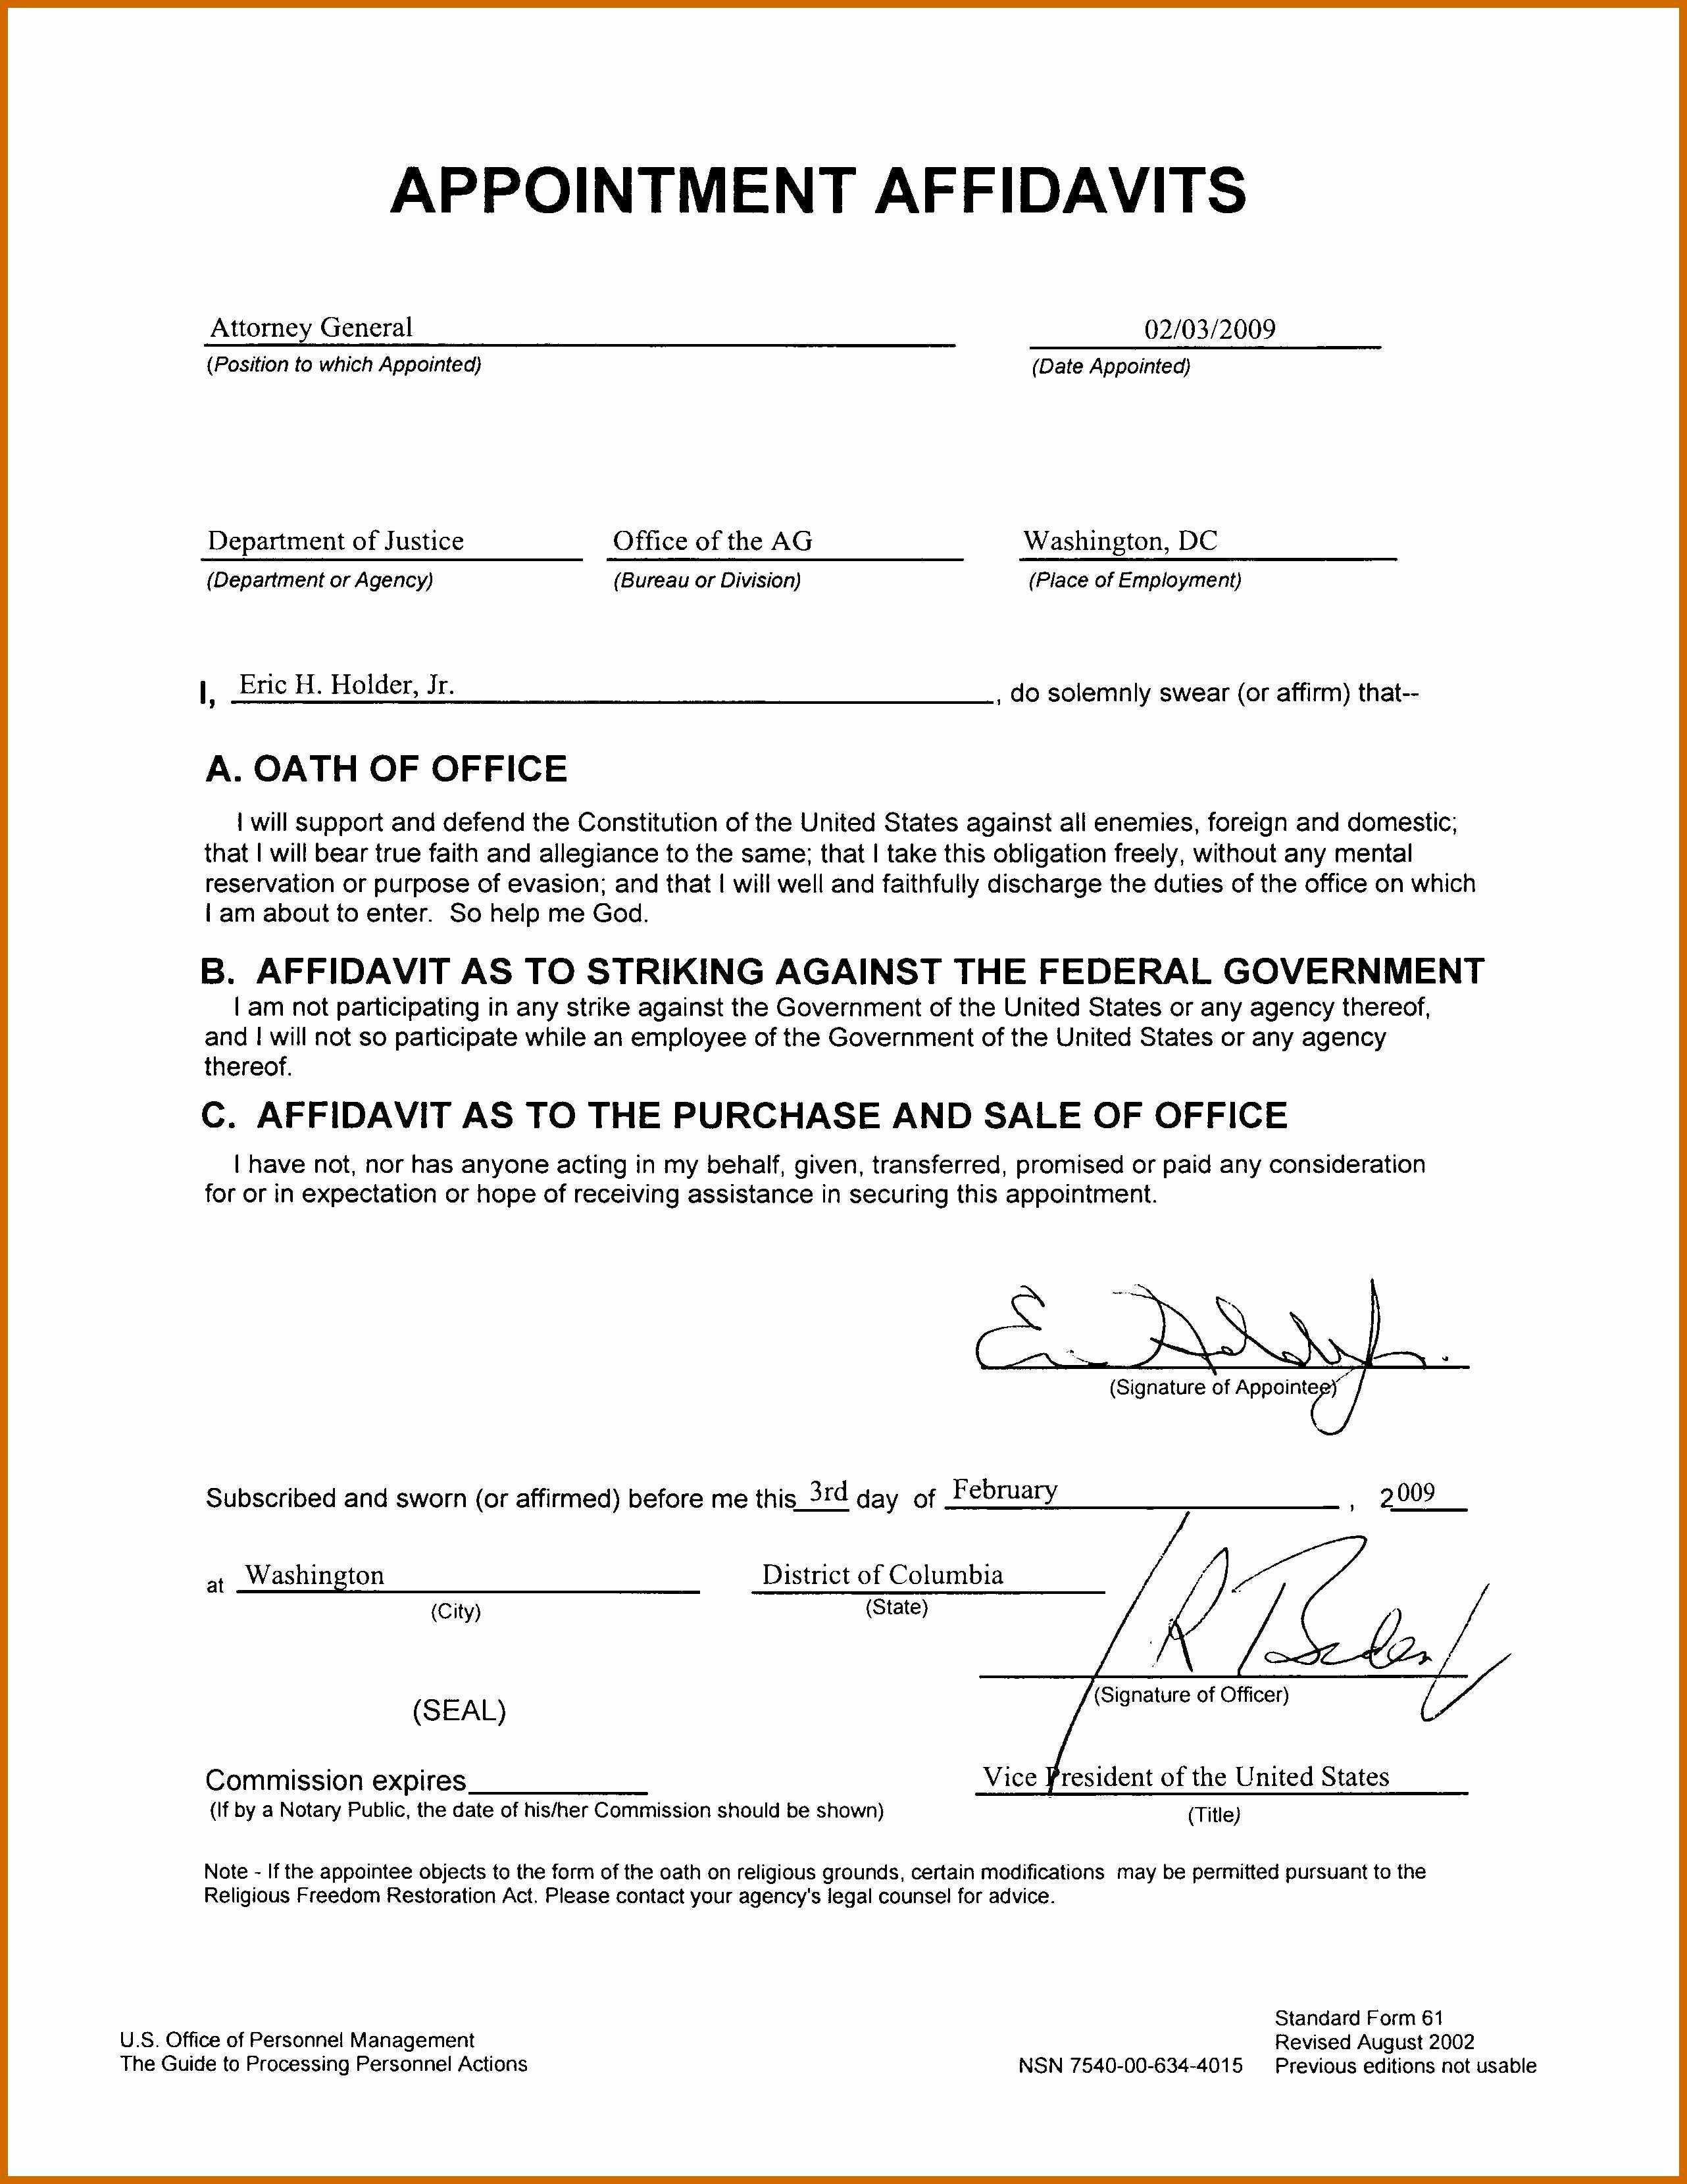 Proof Of Marriage Letter for Immigration Inspirational 3 4 Affidavit Sample Letter